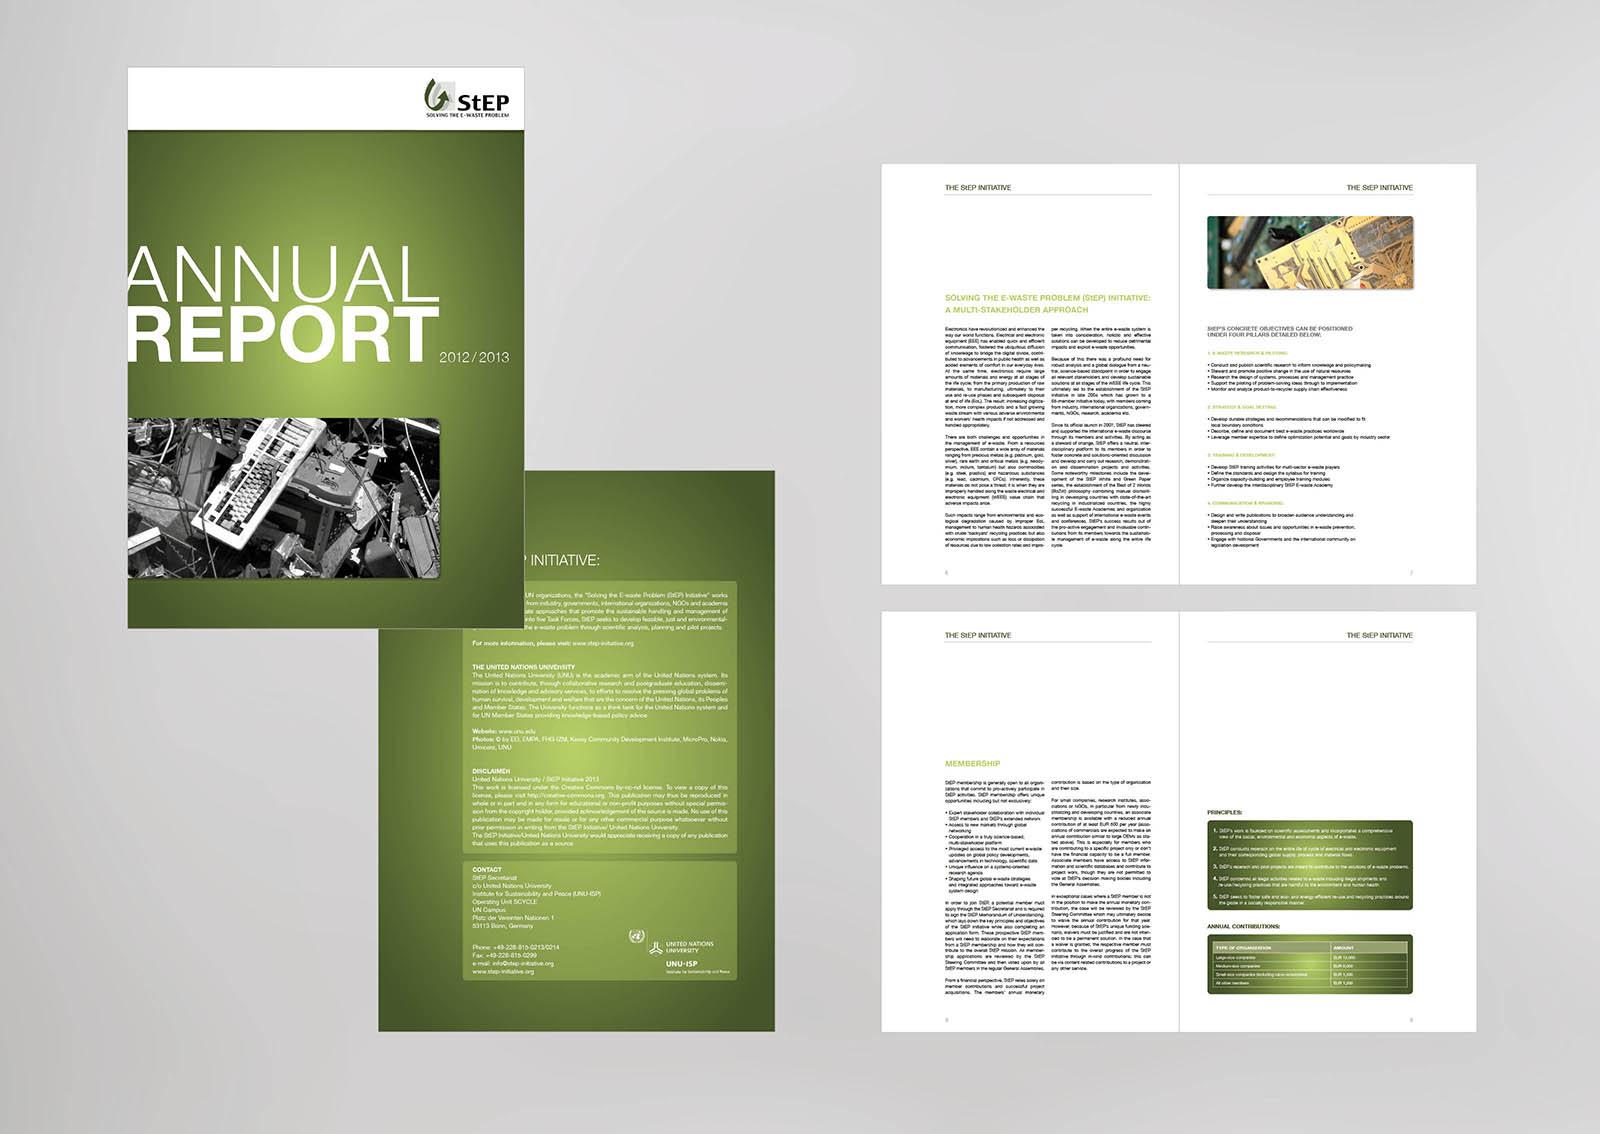 AnnualReport_StEP_2012_2013_01